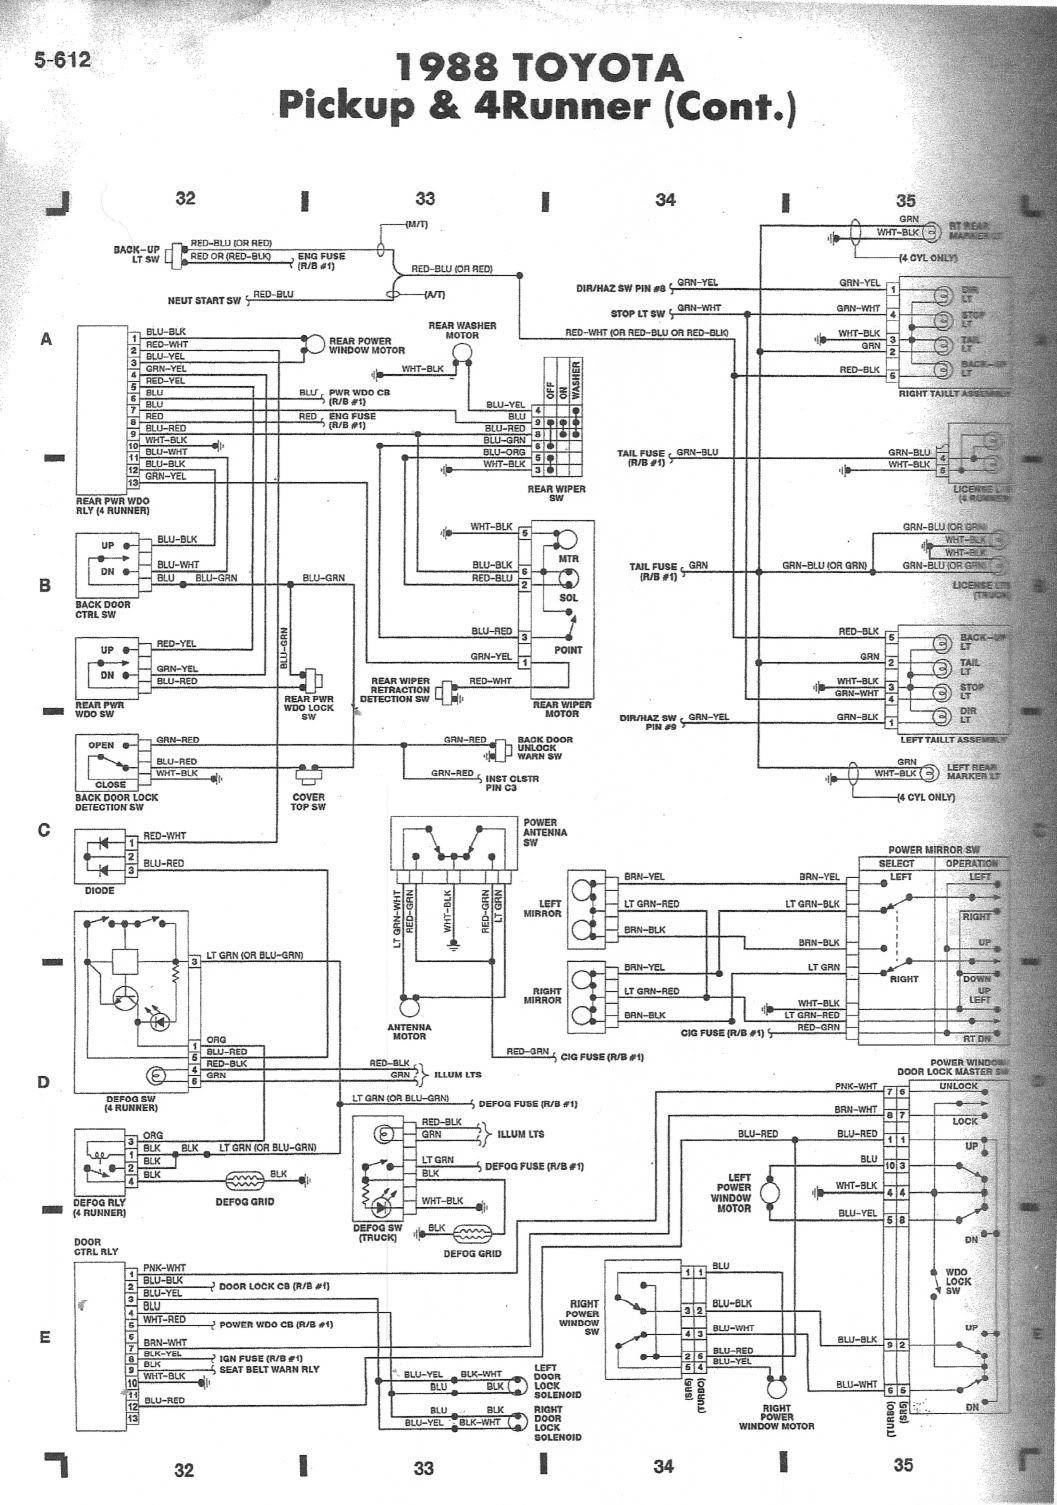 88 3vze 5 speed wiring diagram help page 2 yotatech forums [ 1057 x 1505 Pixel ]